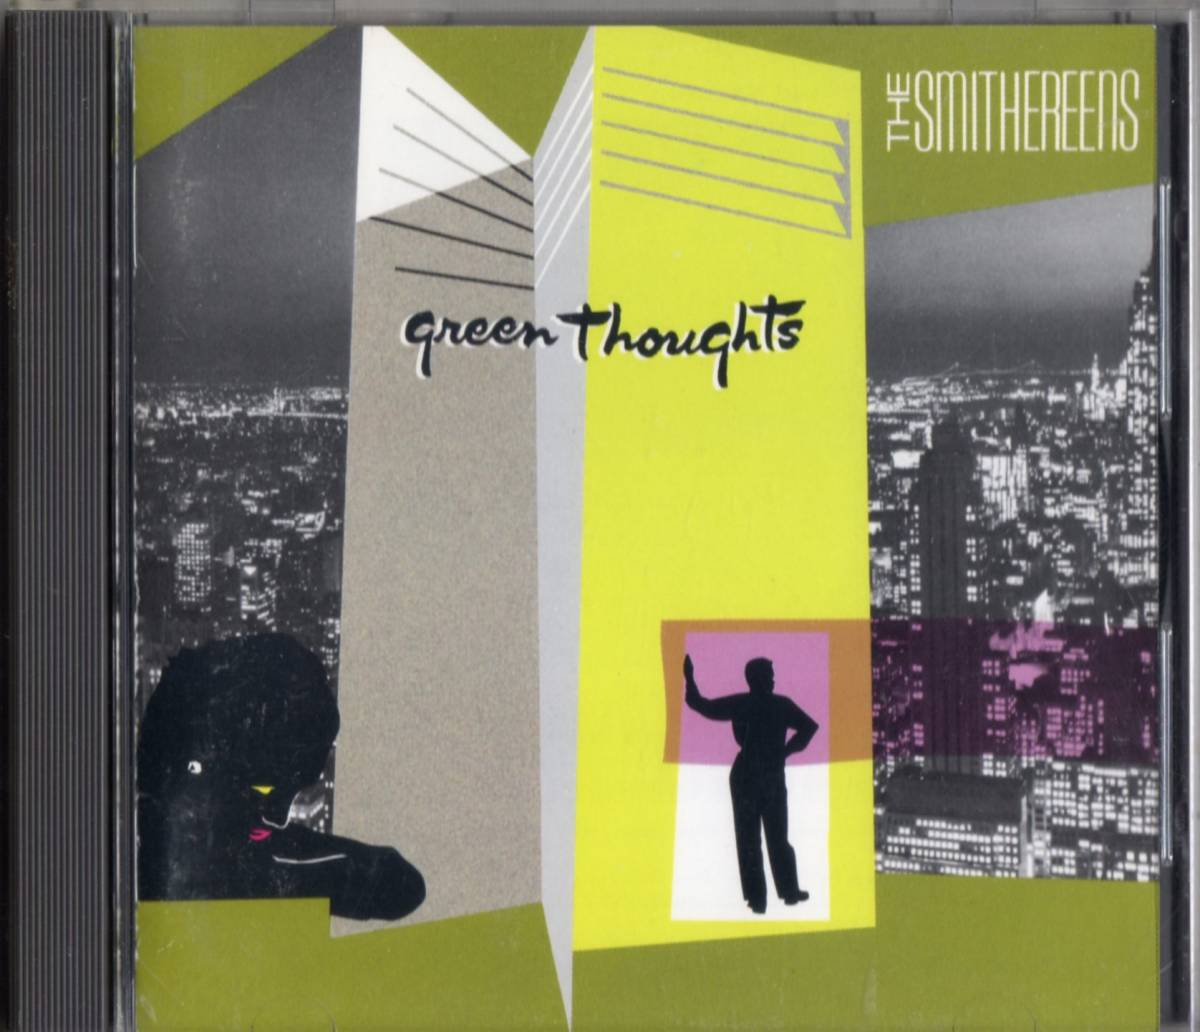 The Smithereens /Green Thoughts【Del Shannon参加・Don Dixonプロデュース日本盤CD】1988年*ザ・スミザリーンズ_画像1